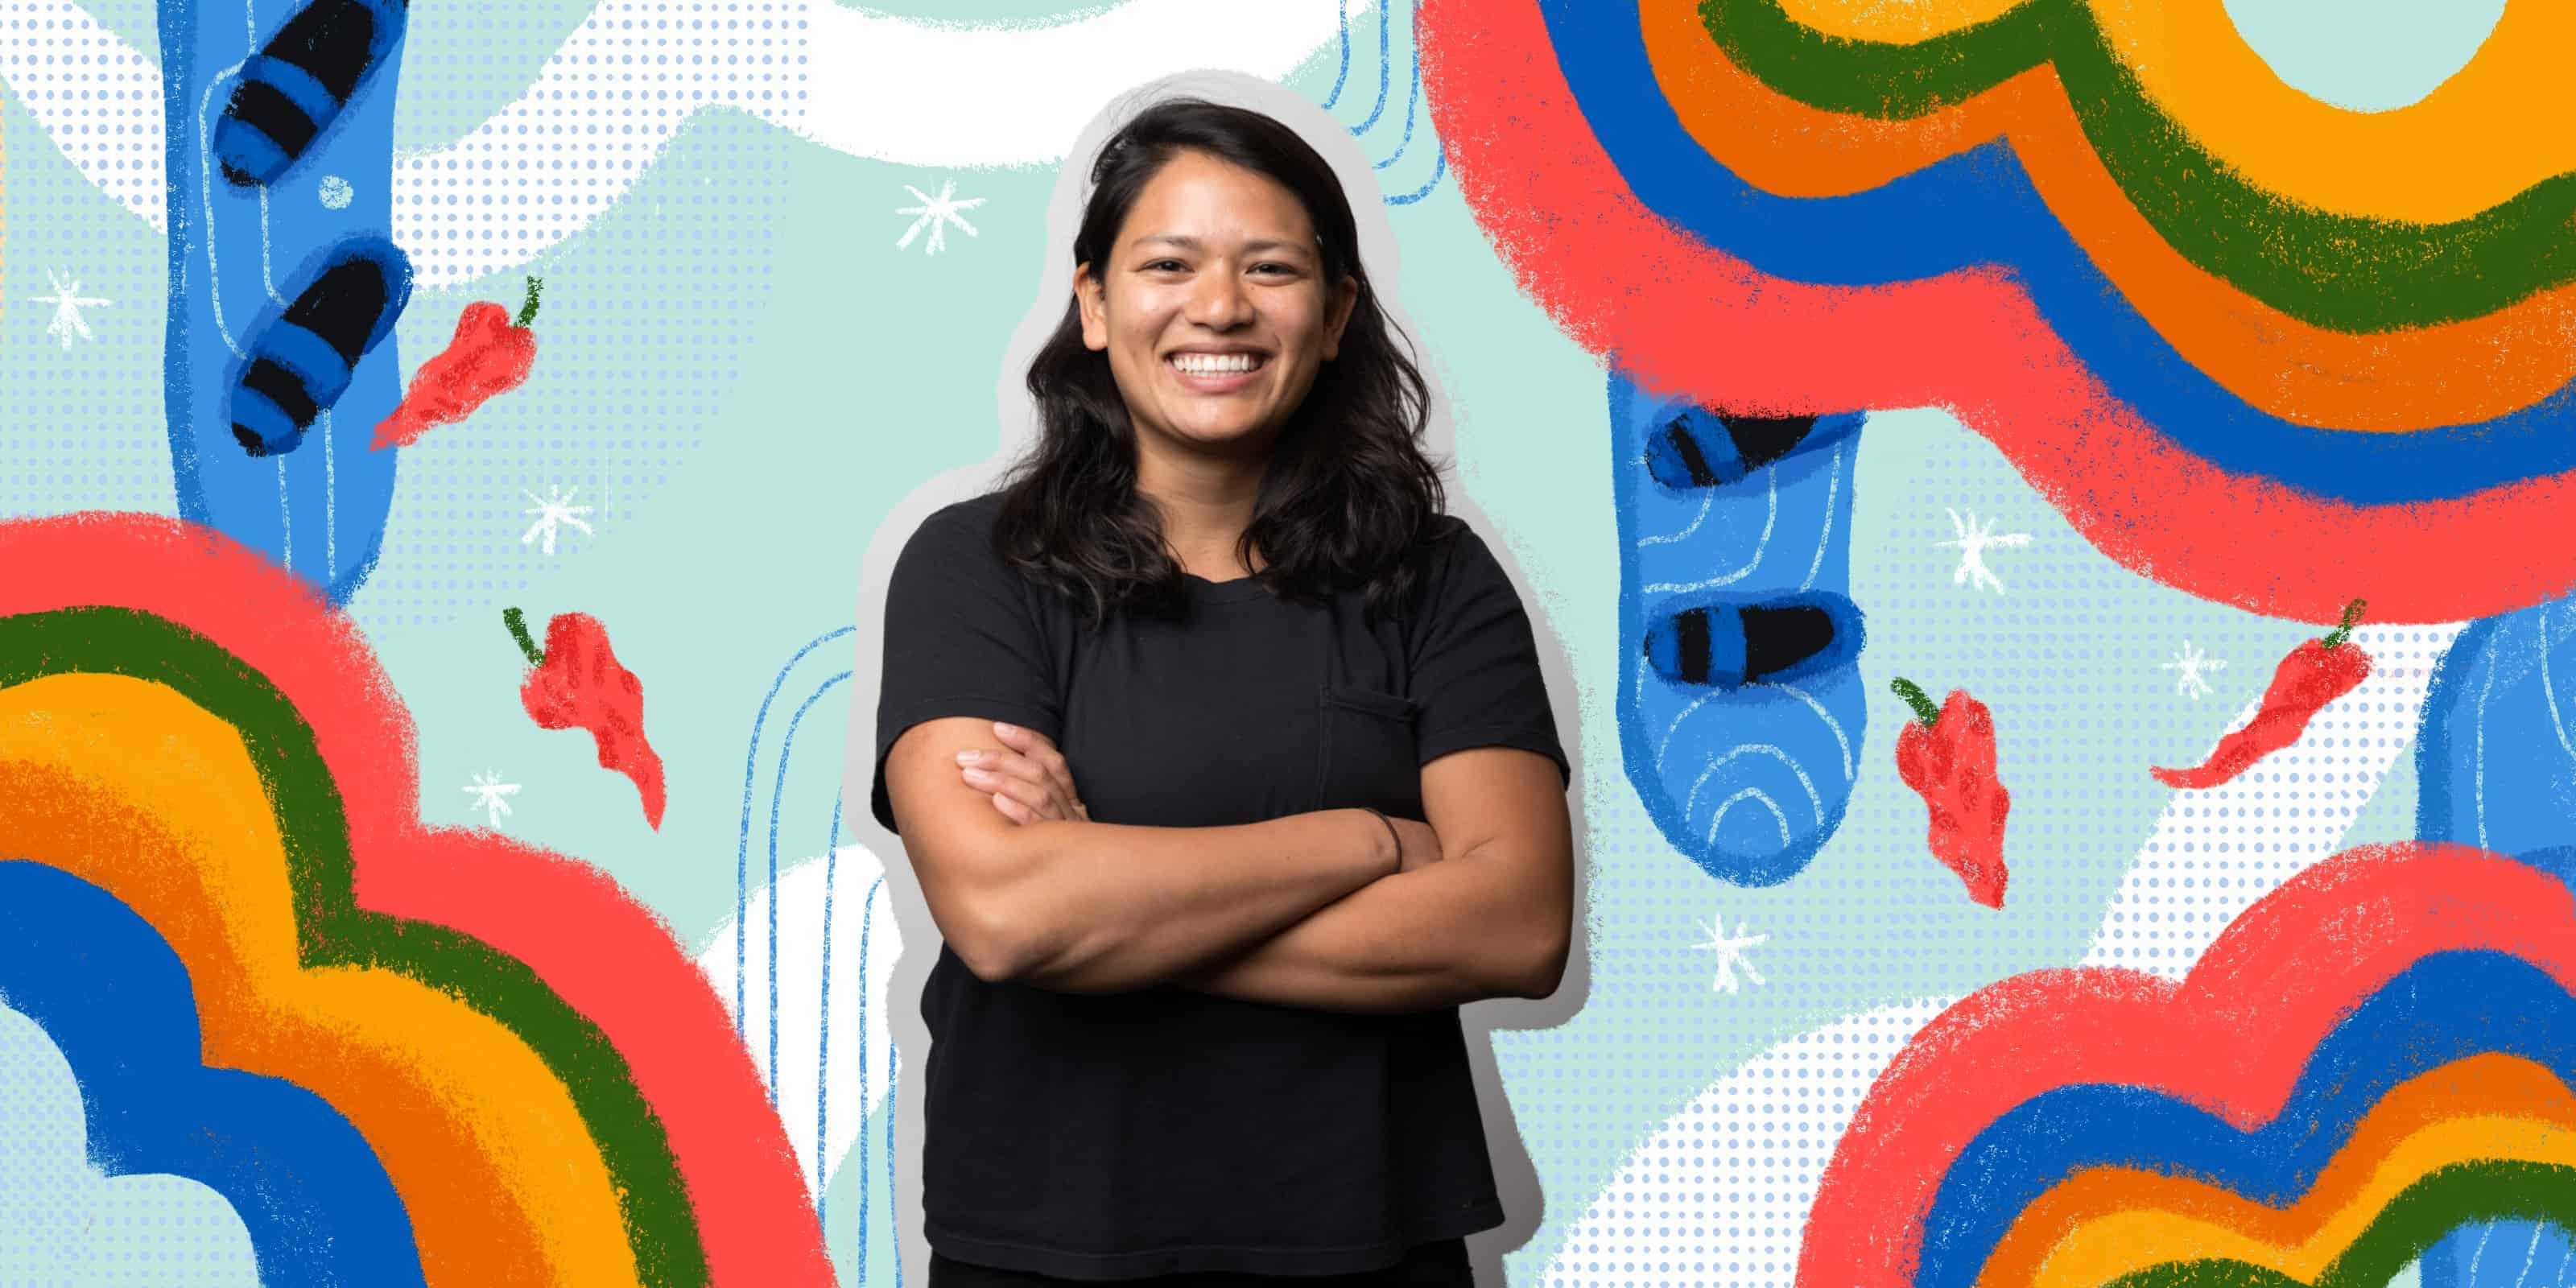 Women's History Month employee spotlight: Natalie Uduwela